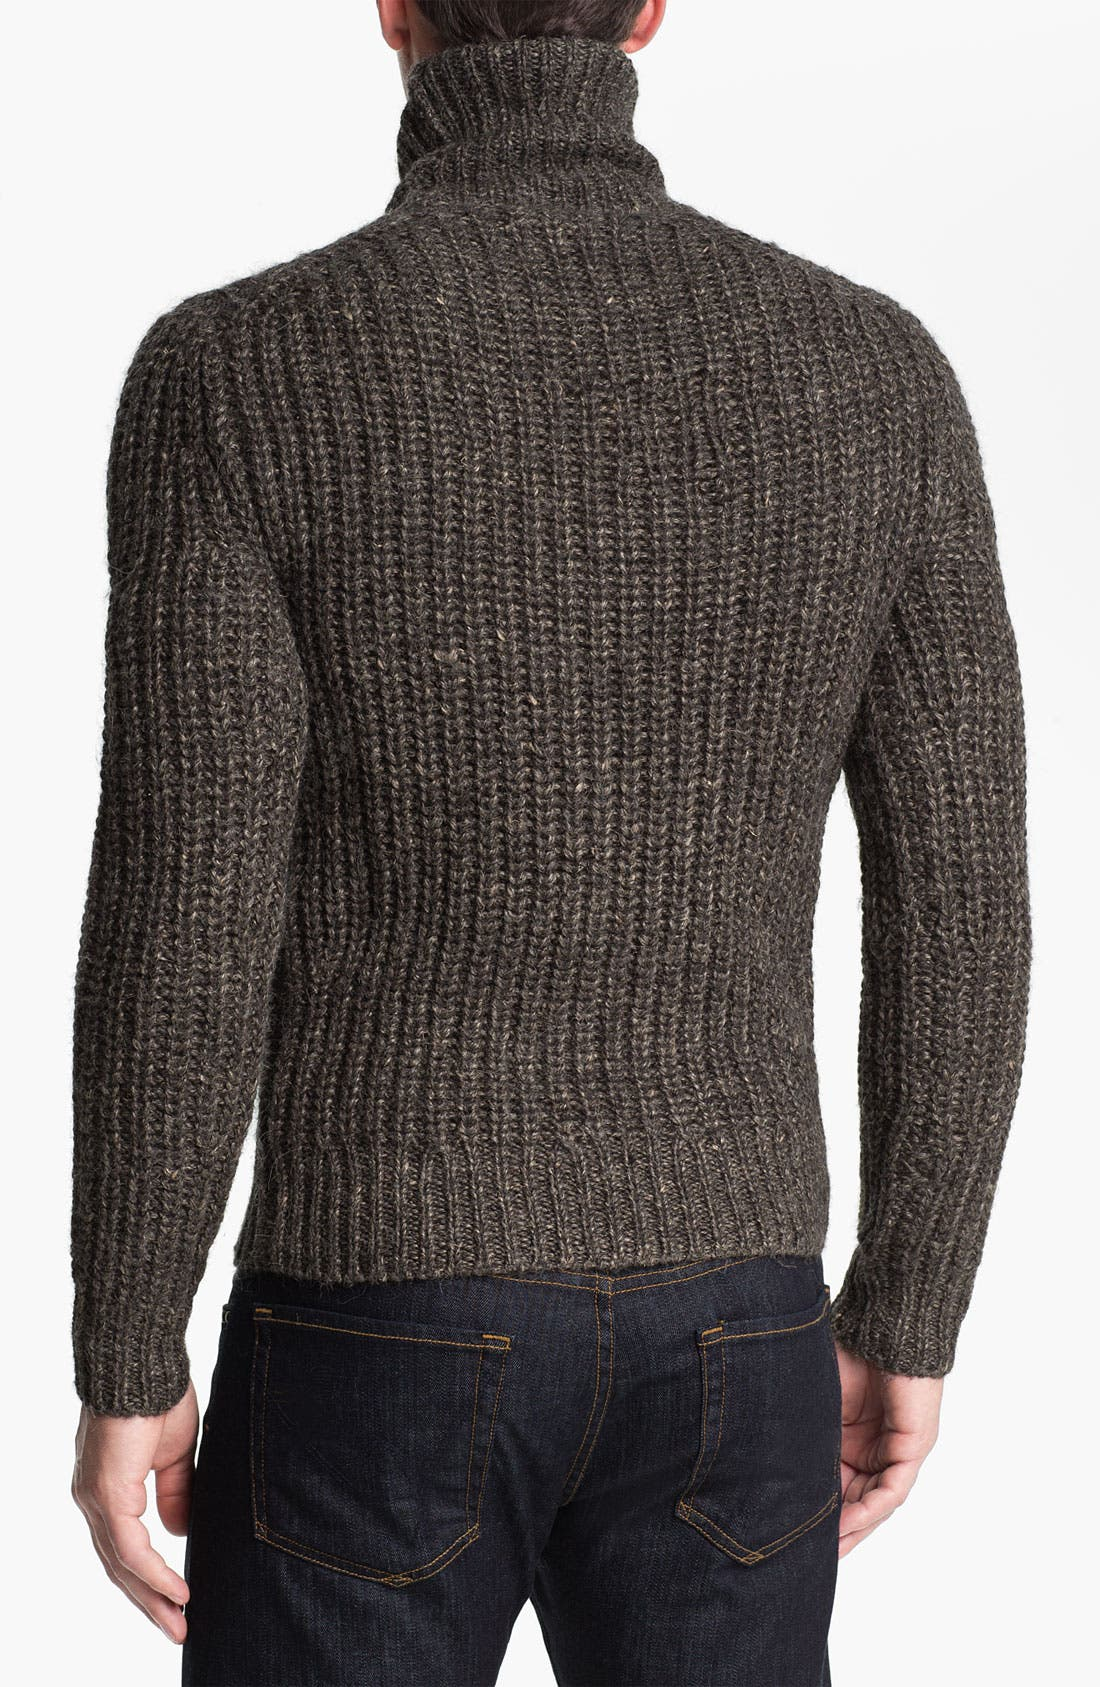 MICHAEL KORS,                             Alpaca Blend Turtleneck Sweater,                             Alternate thumbnail 3, color,                             029